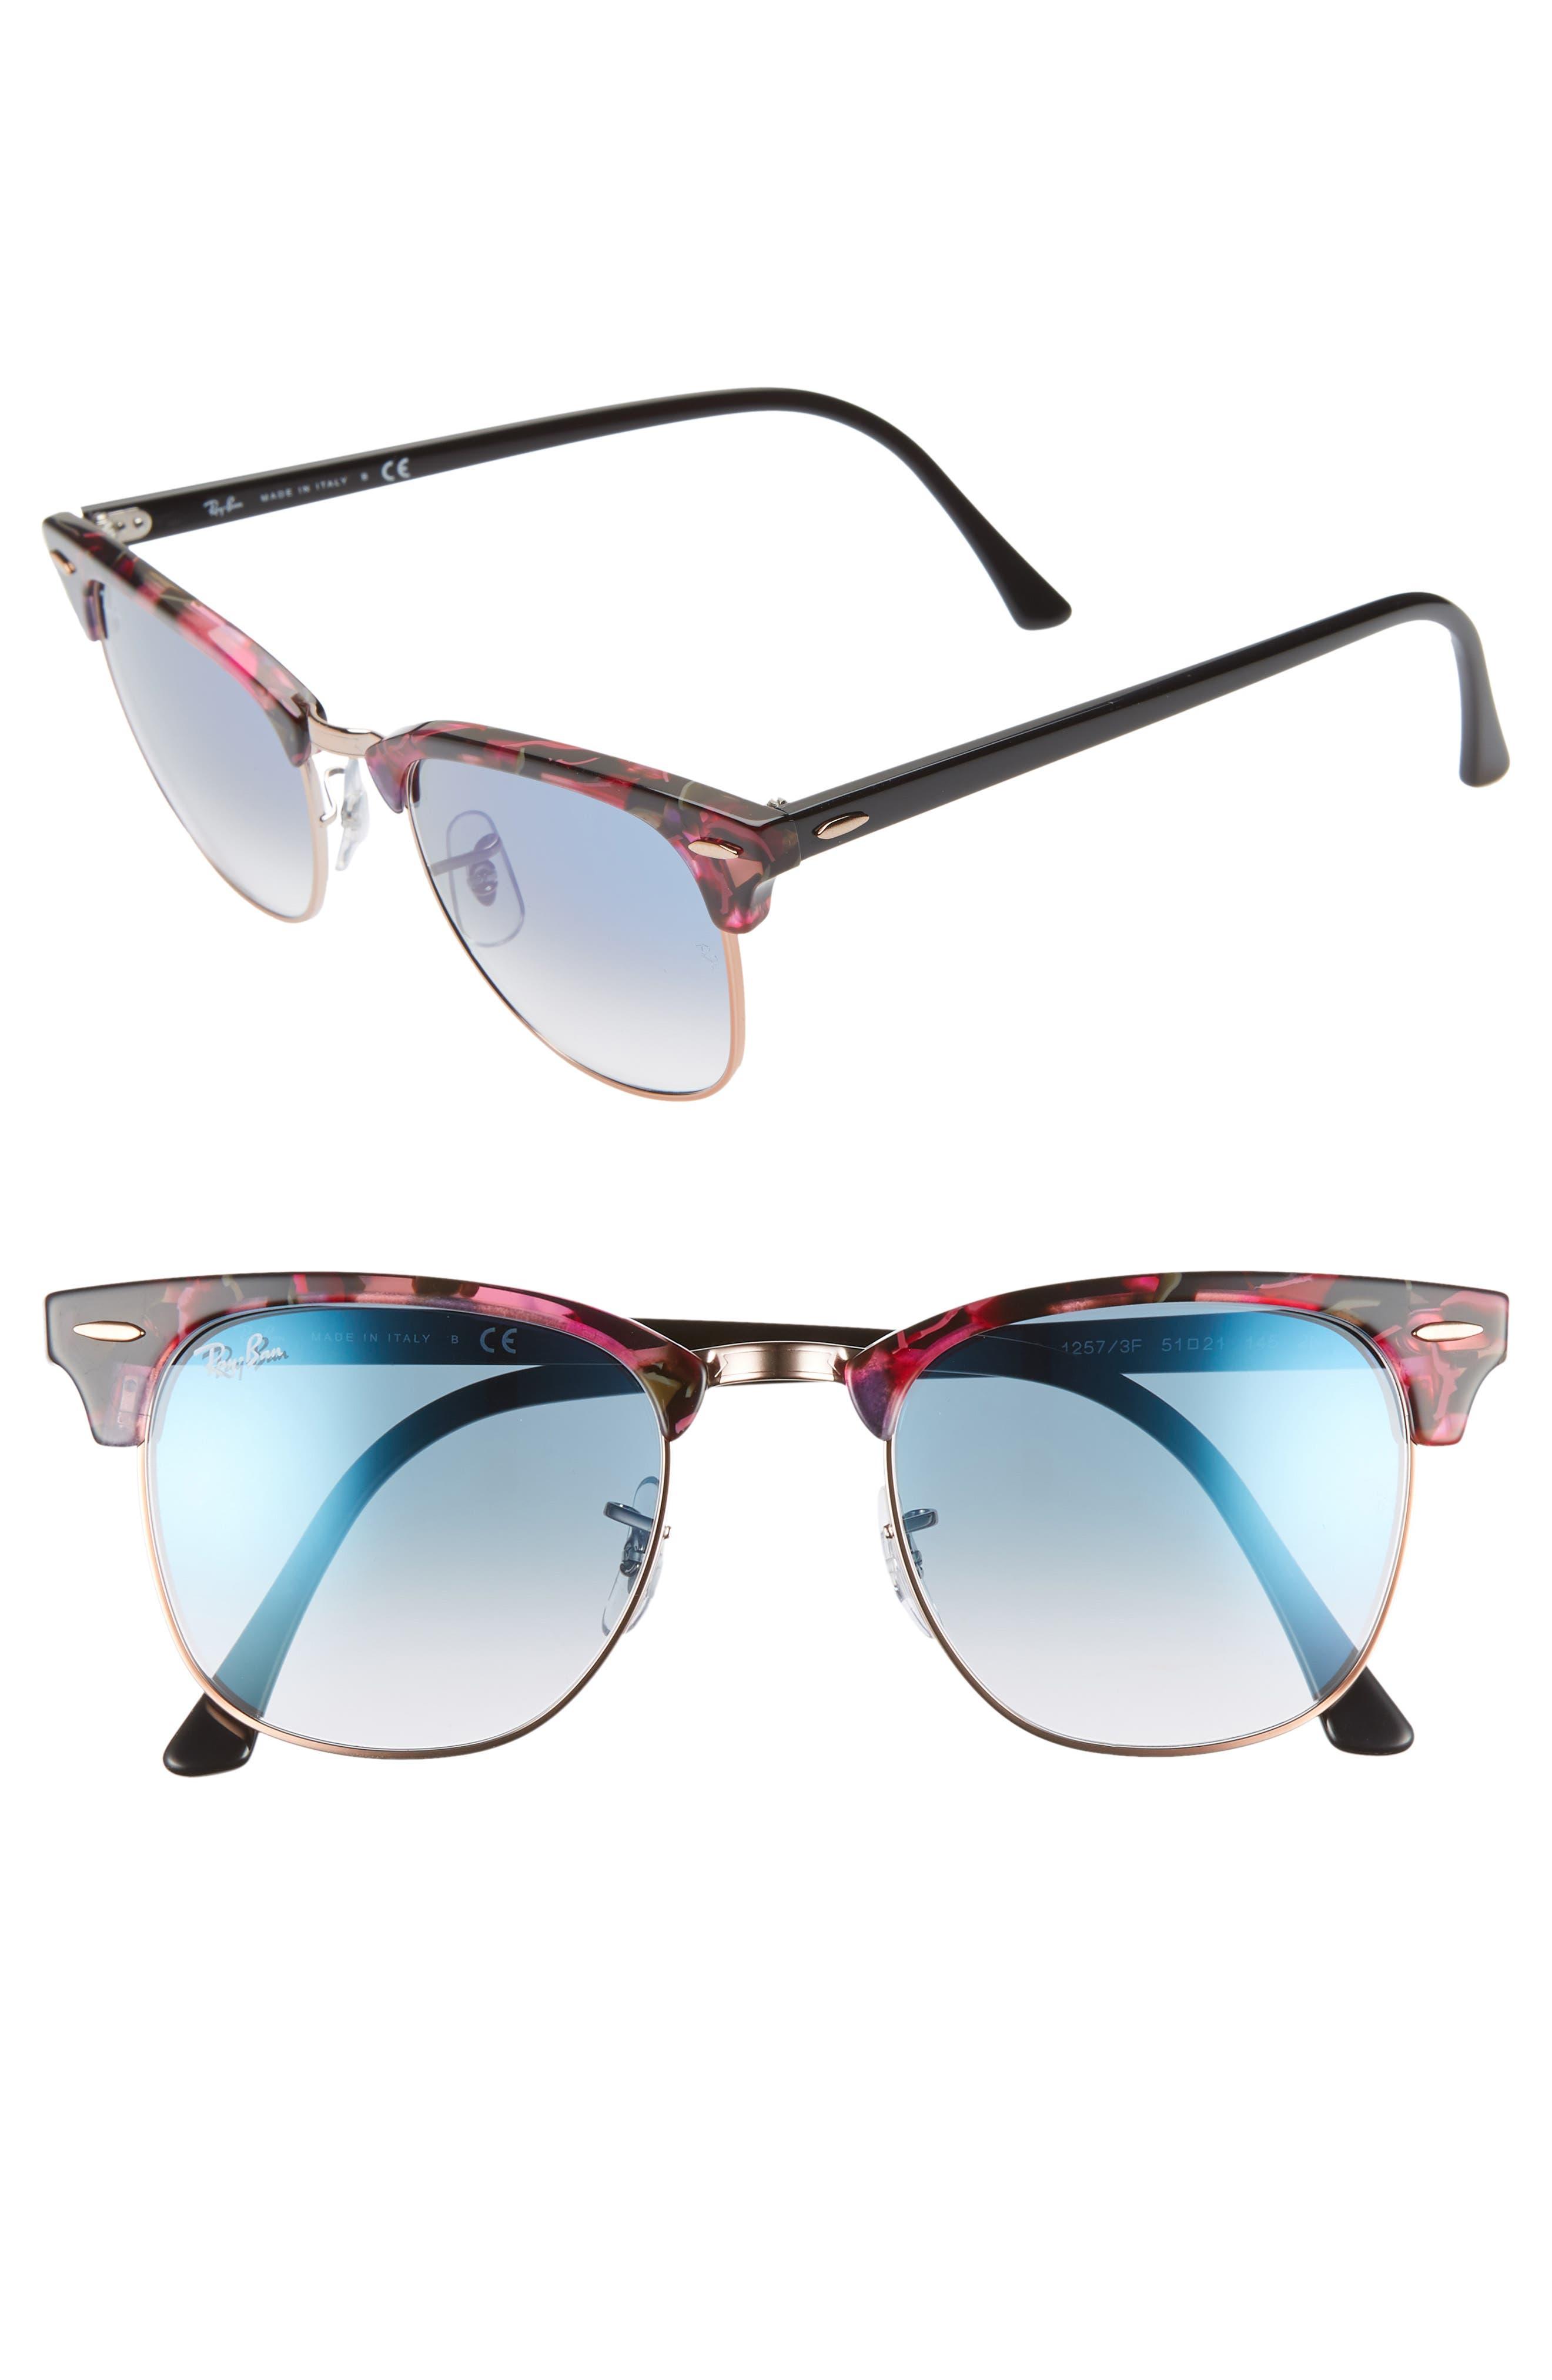 Clubmaster 51mm Gradient Sunglasses,                             Main thumbnail 1, color,                             GREY/ VIOLET GRADIENT